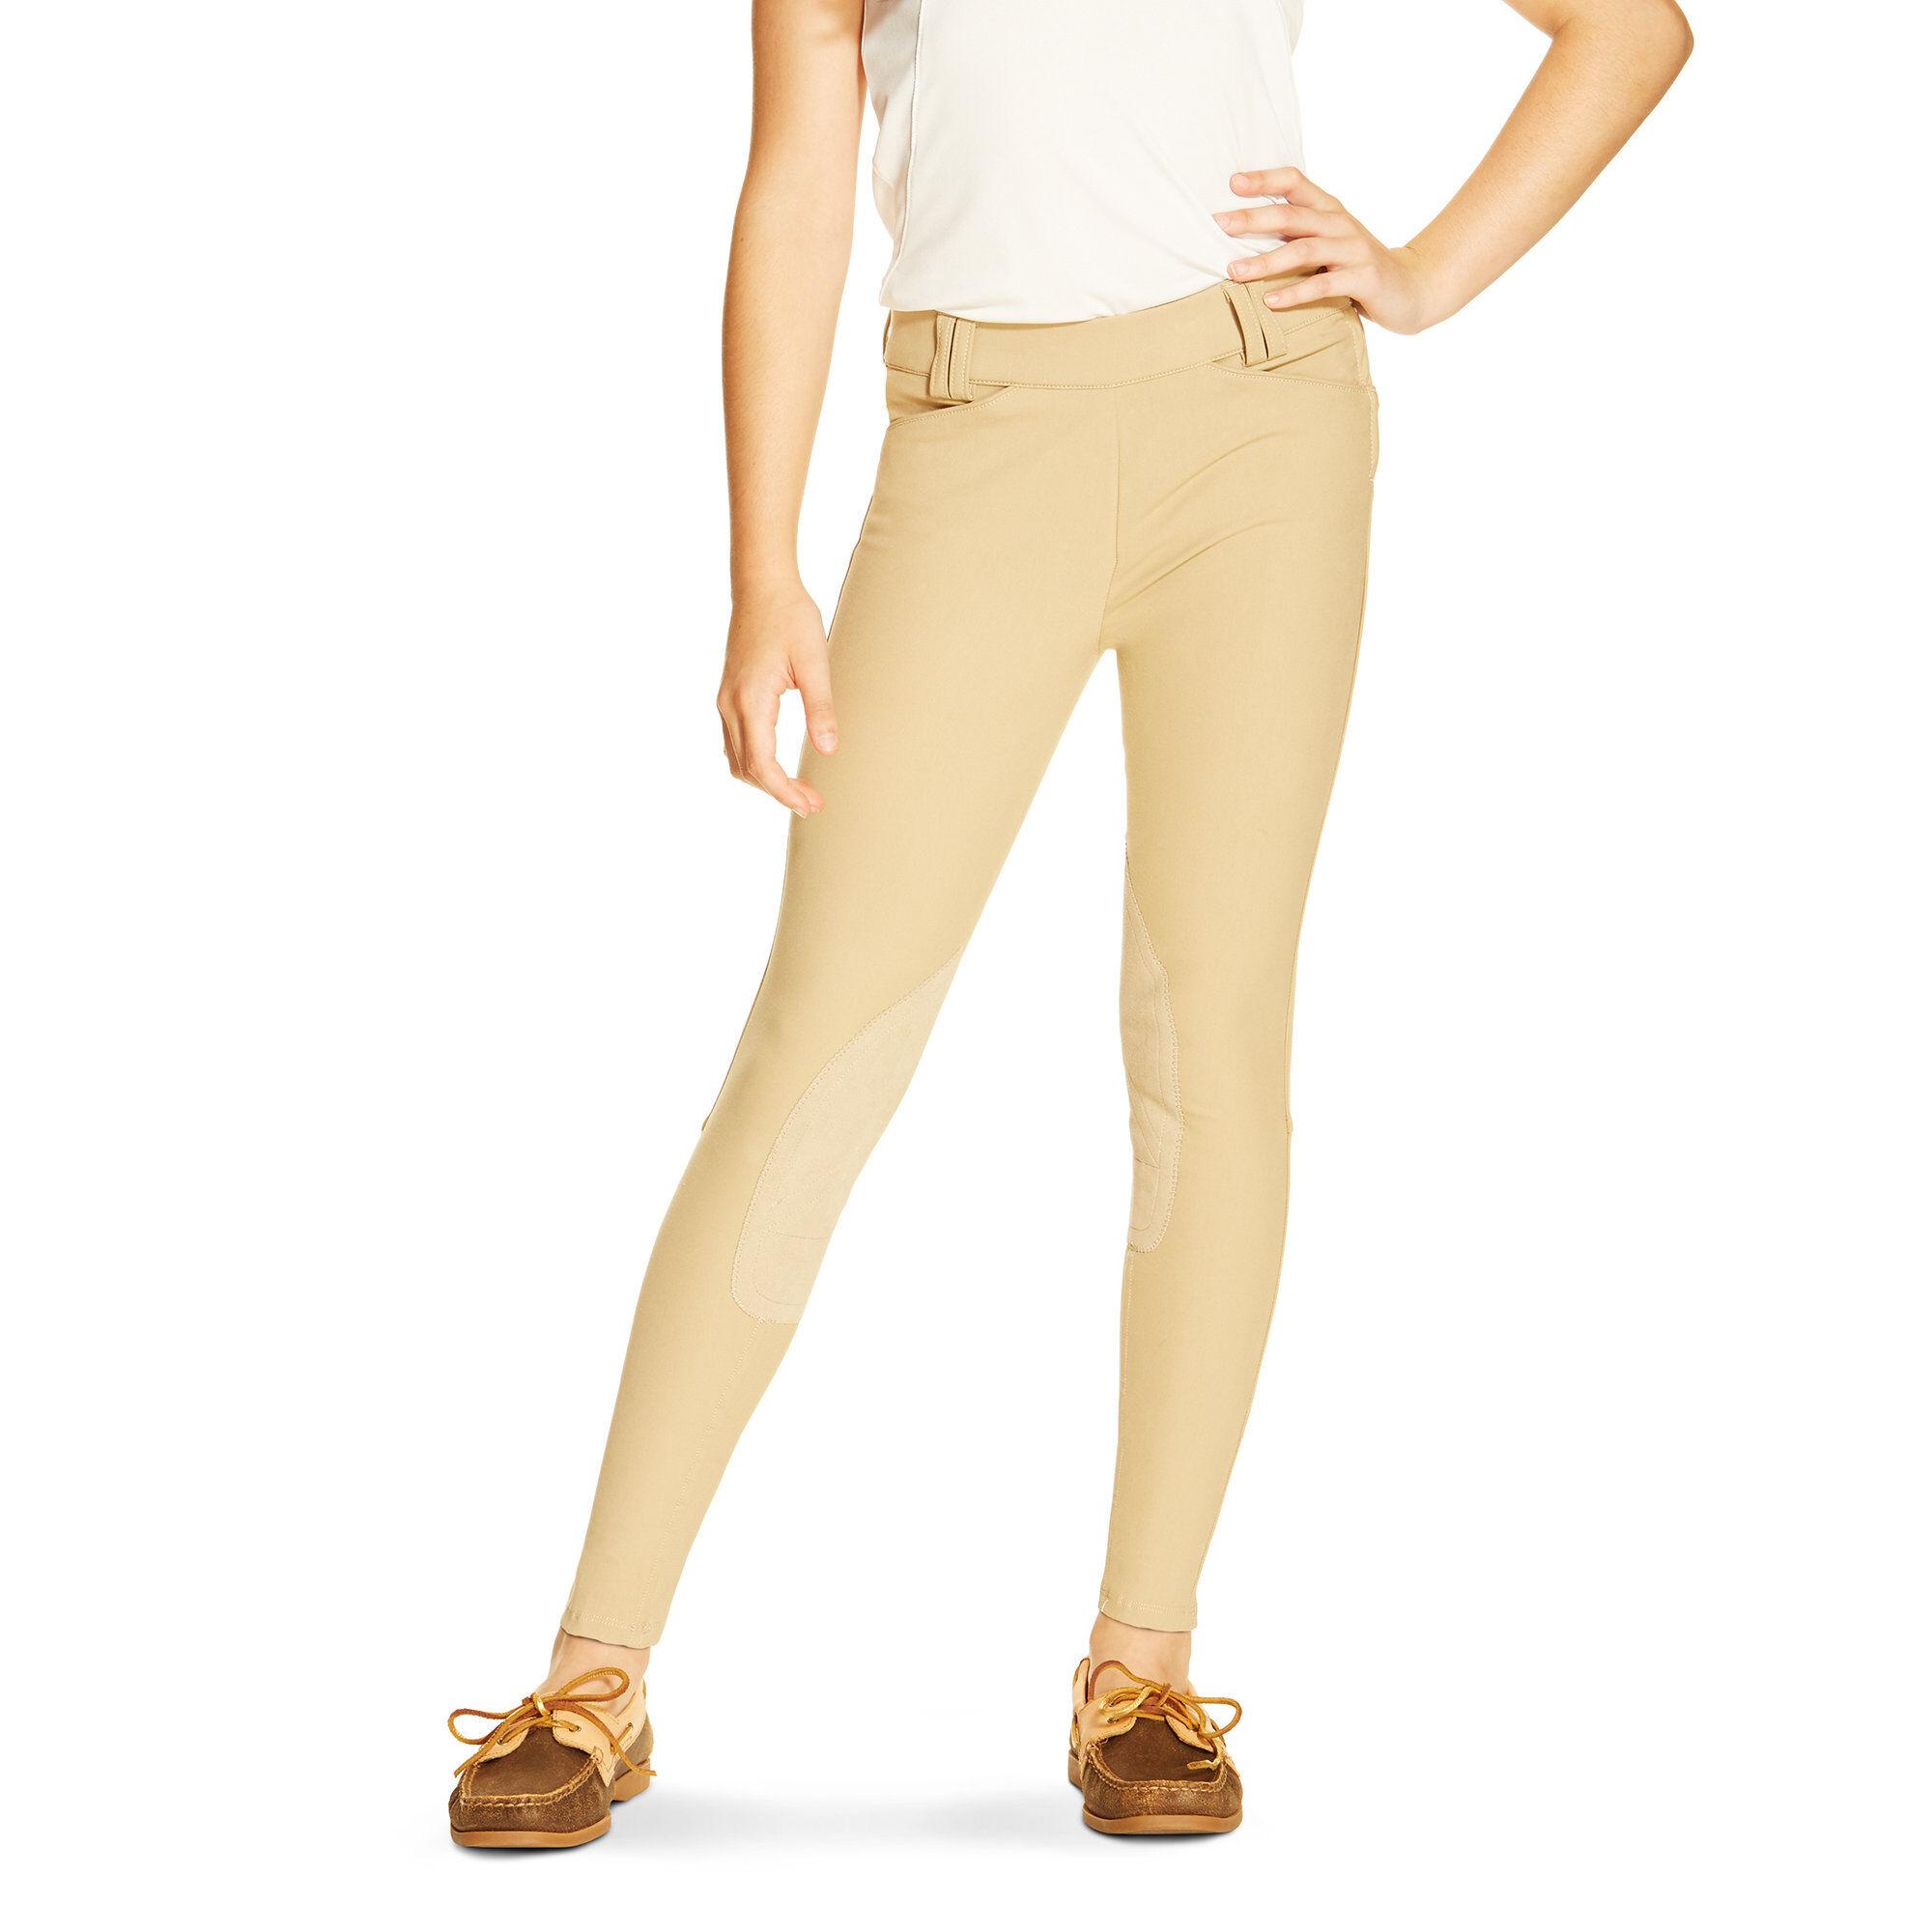 Performer Knee Patch, Side Zip Side Zip Knee Patch Breech